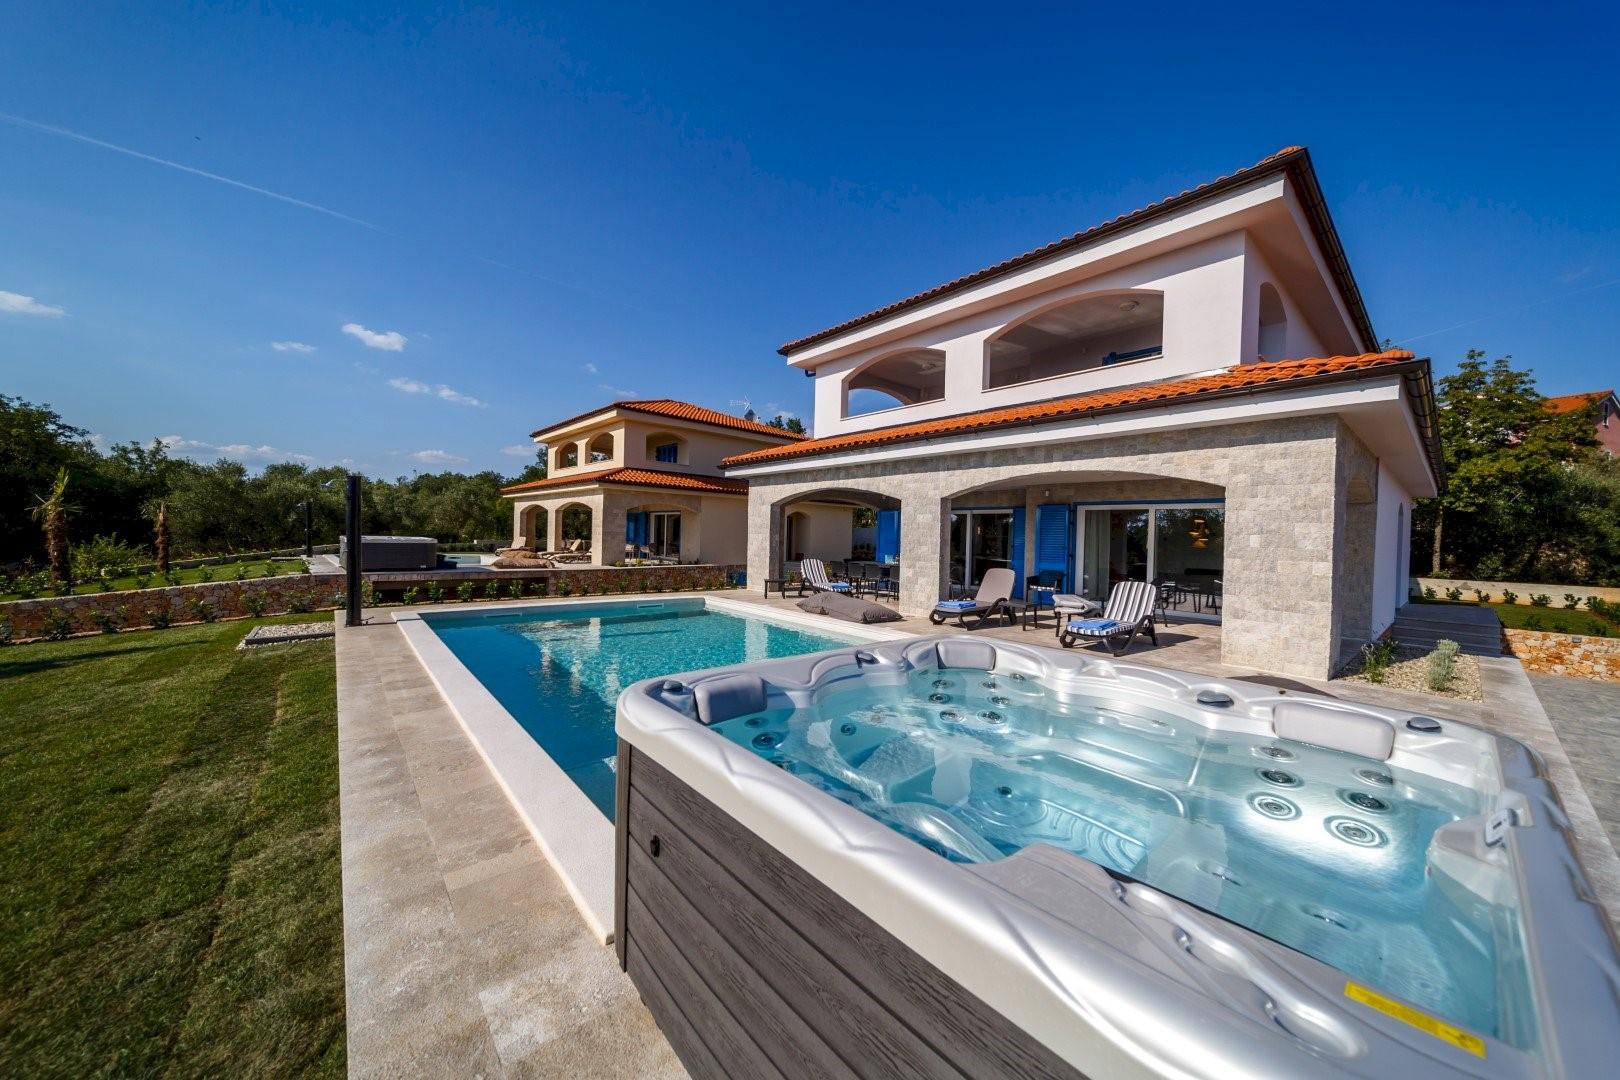 Ferienhaus Luxury Villa Loma 2 (2586643), Sveti Vid-Miholjice, Insel Krk, Kvarner, Kroatien, Bild 3